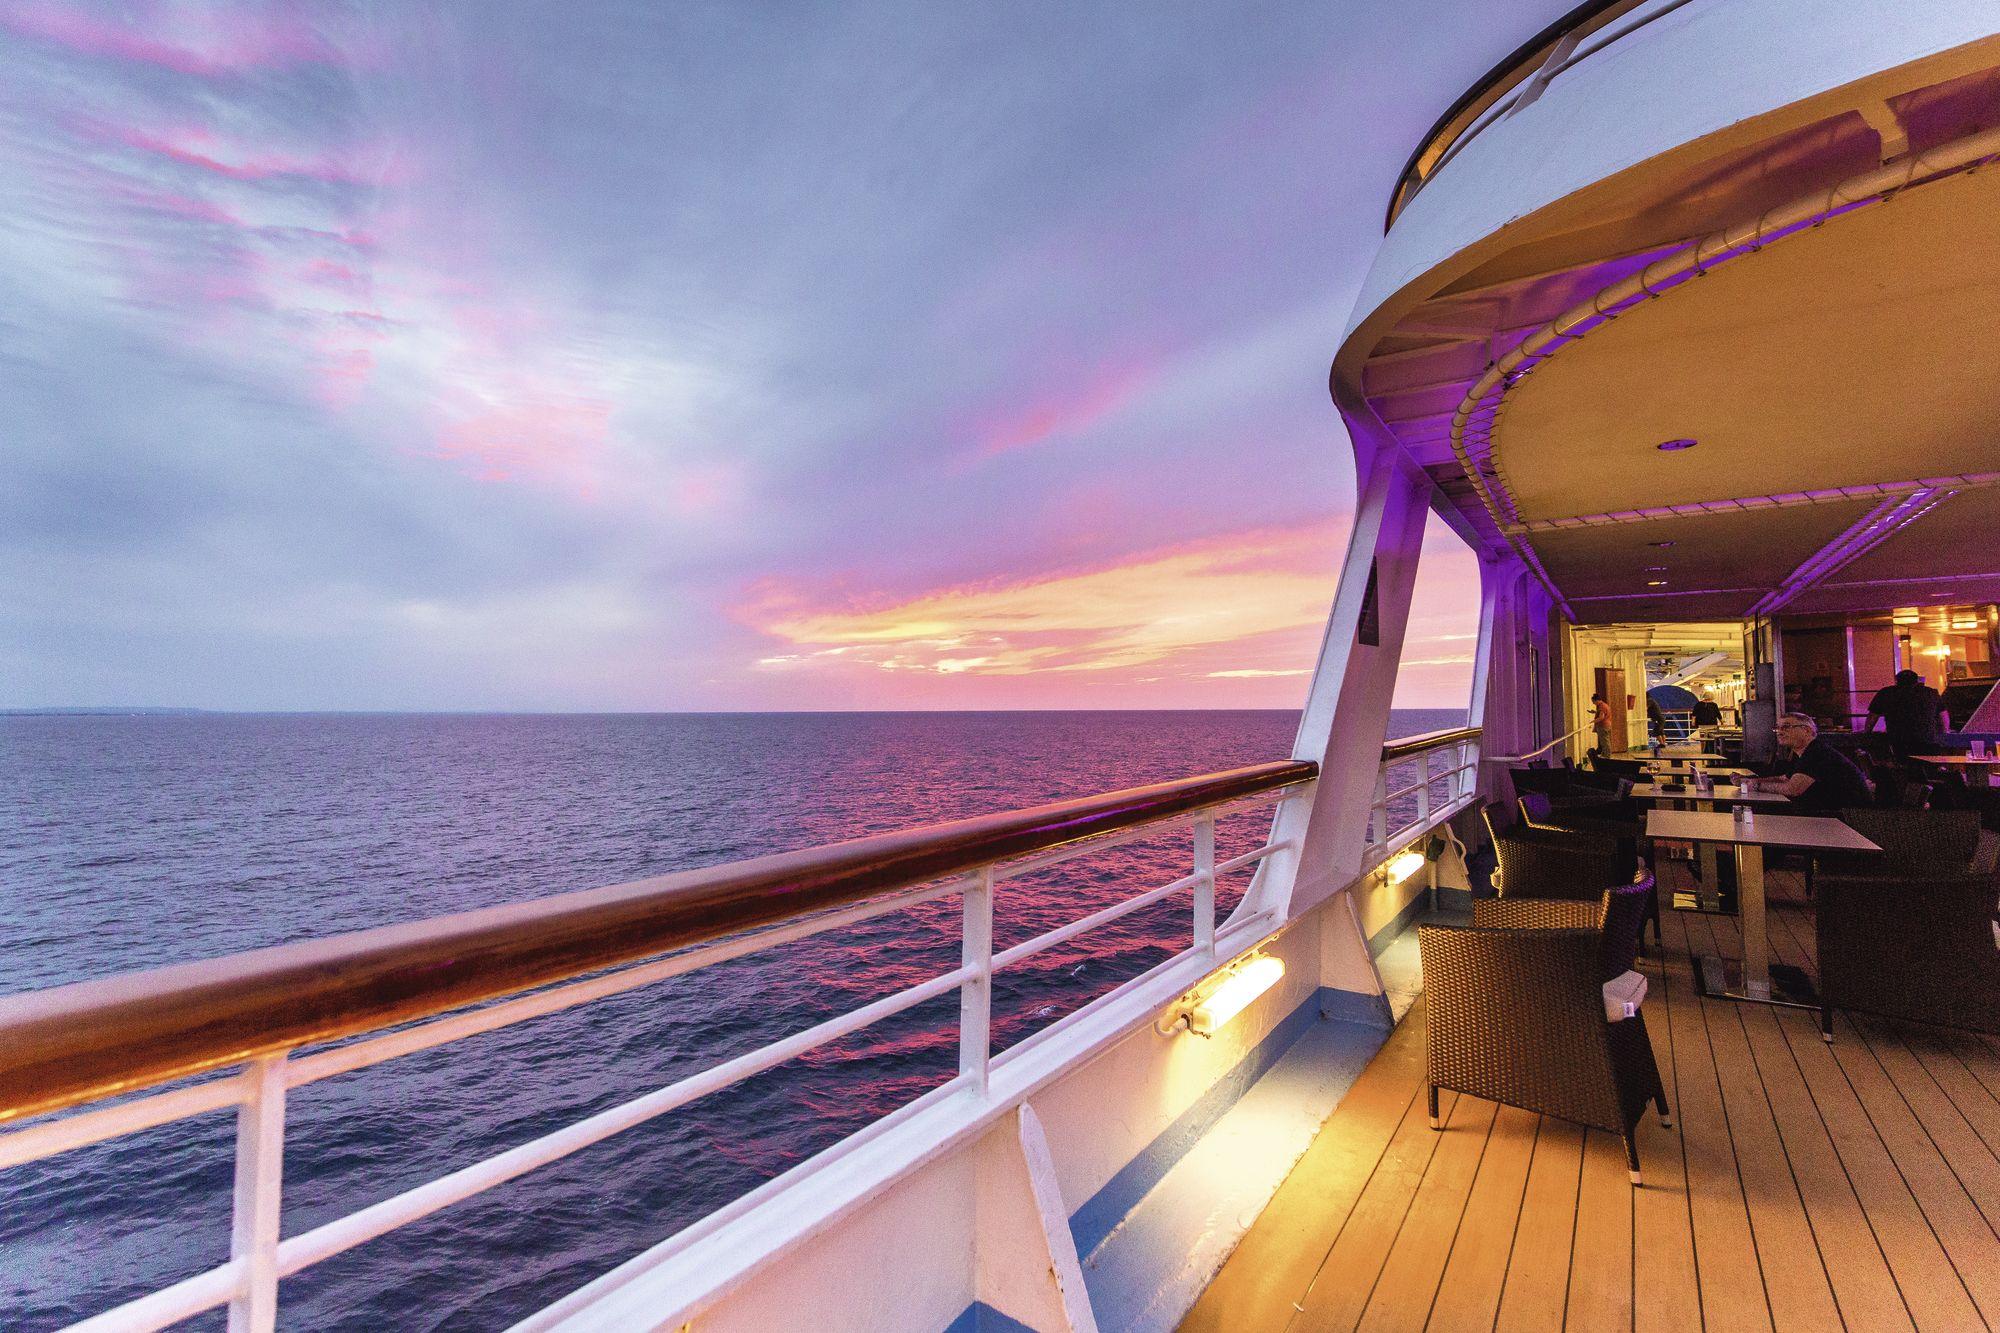 Marella Dream Cruise Holiday Deals 2019 2020